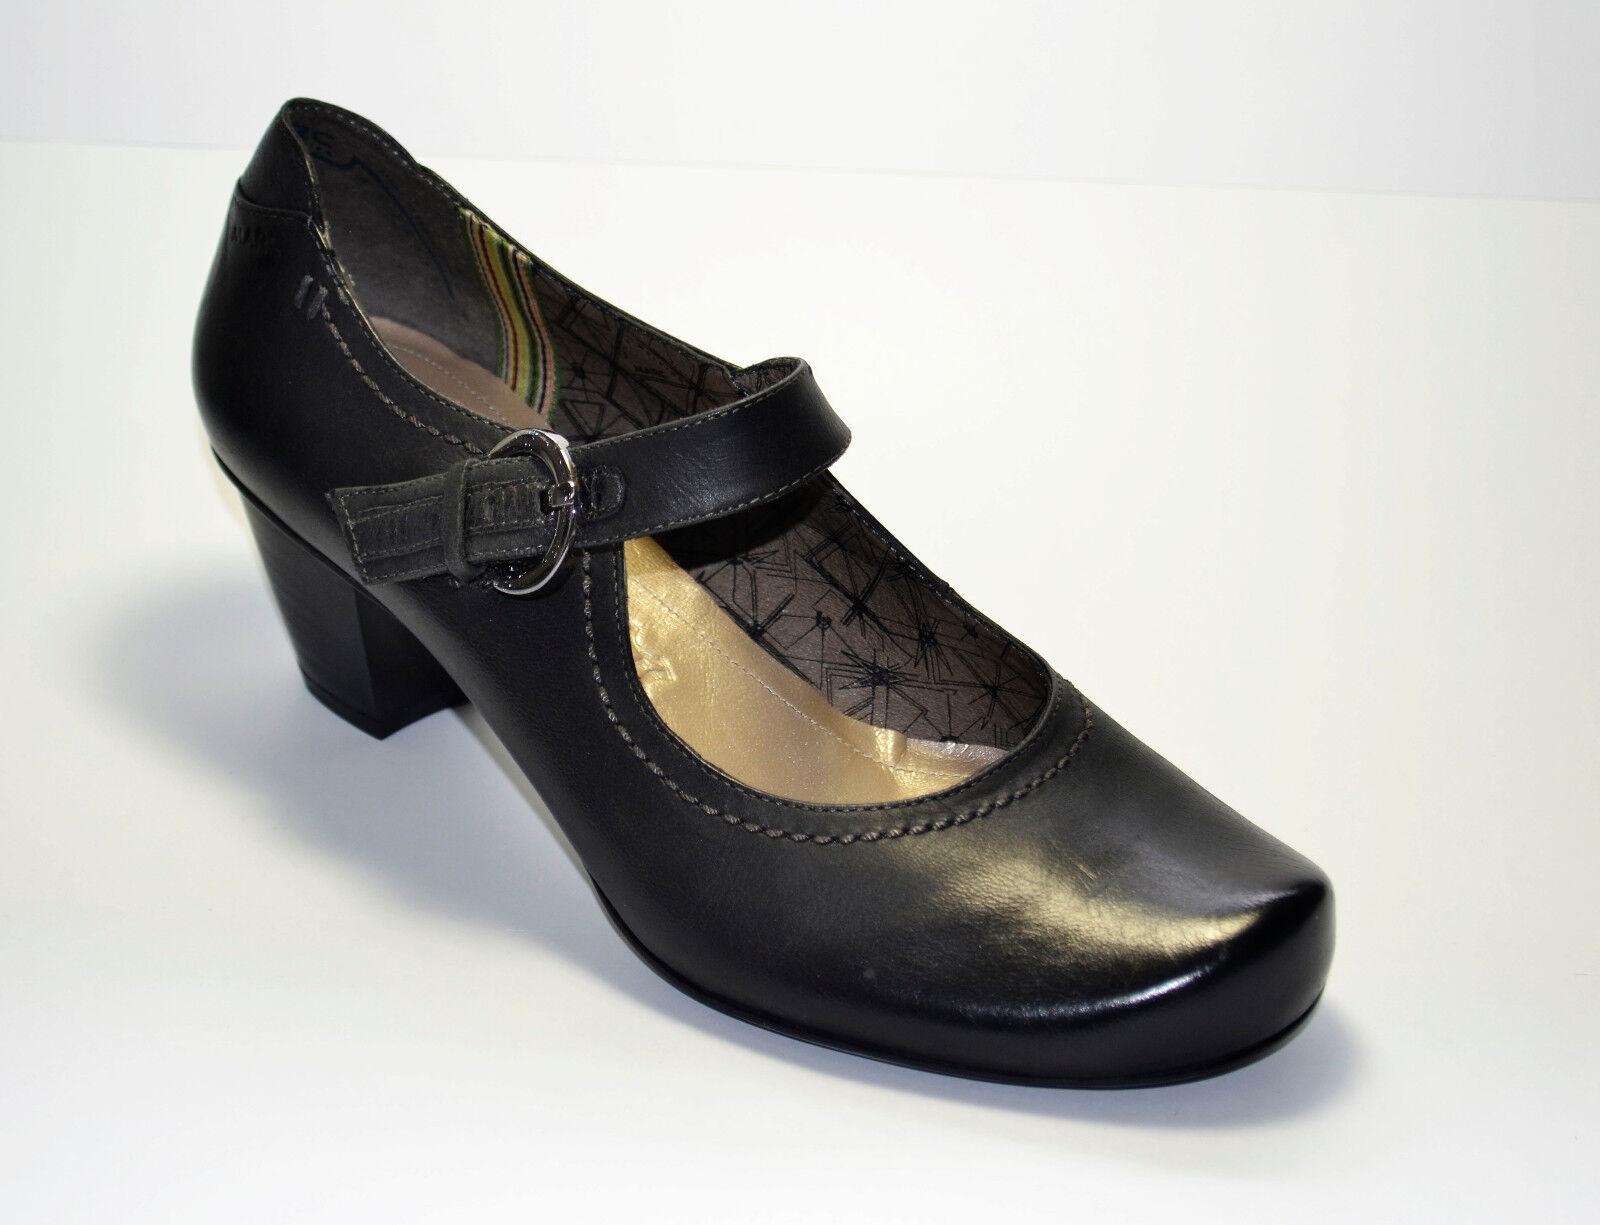 Zapatos señora zapatos marc spangenschuh negros negros negros talla 42 (PE 1923 s)  hasta 60% de descuento